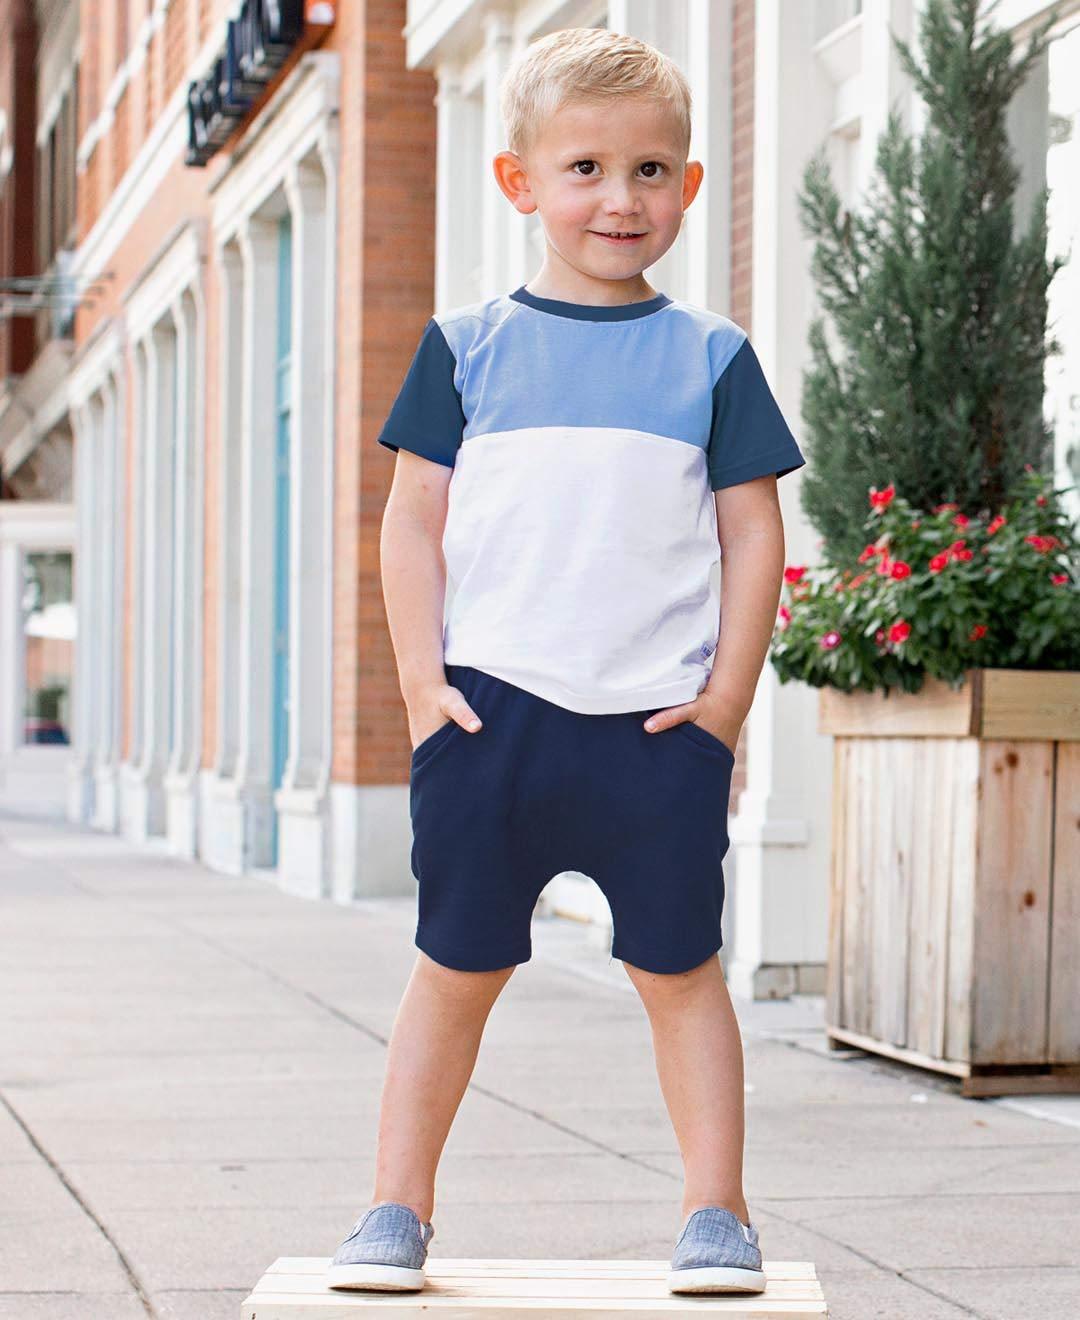 Lurryly 2Pcs Toddler Boys Girls American Flag Splice T-Shirt Denim Shorts Outfits 1-5 T